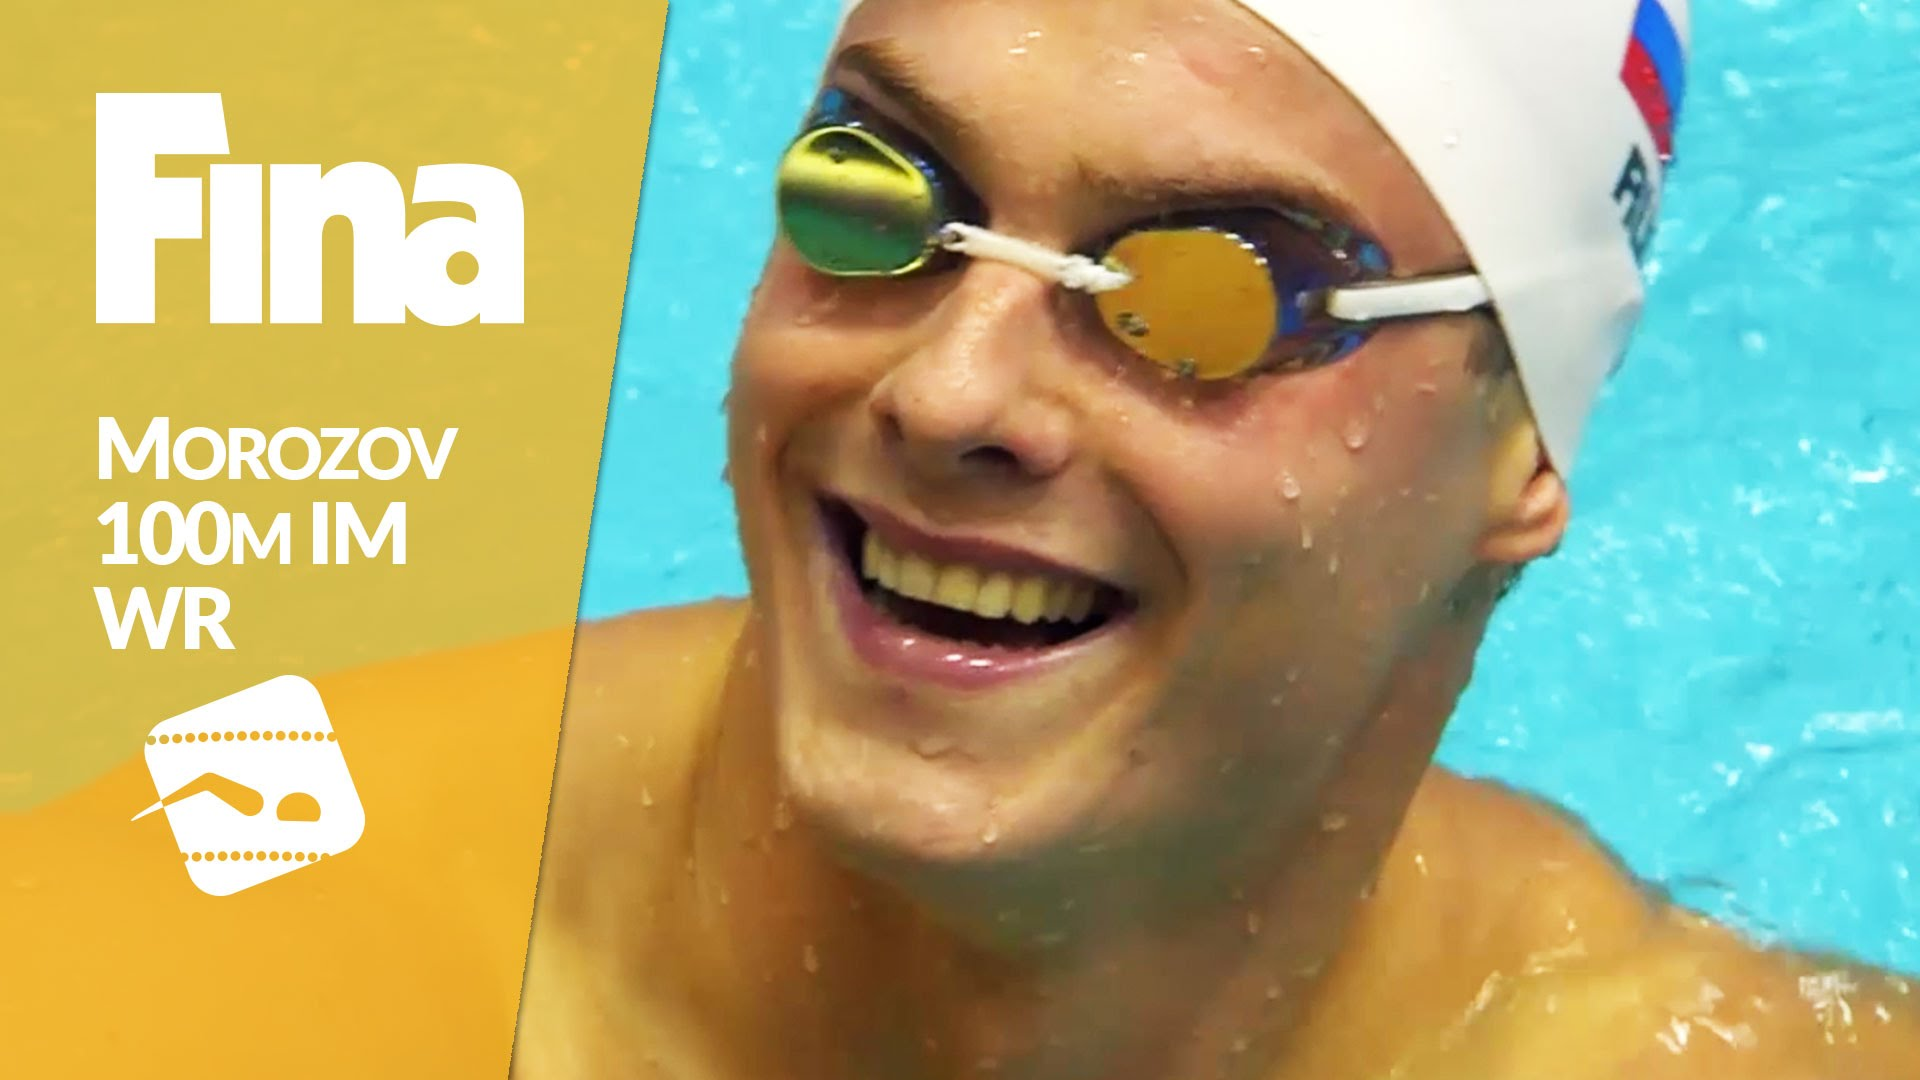 Vladimir Morozov (RUS) 50.30 and new 100 IM World Record